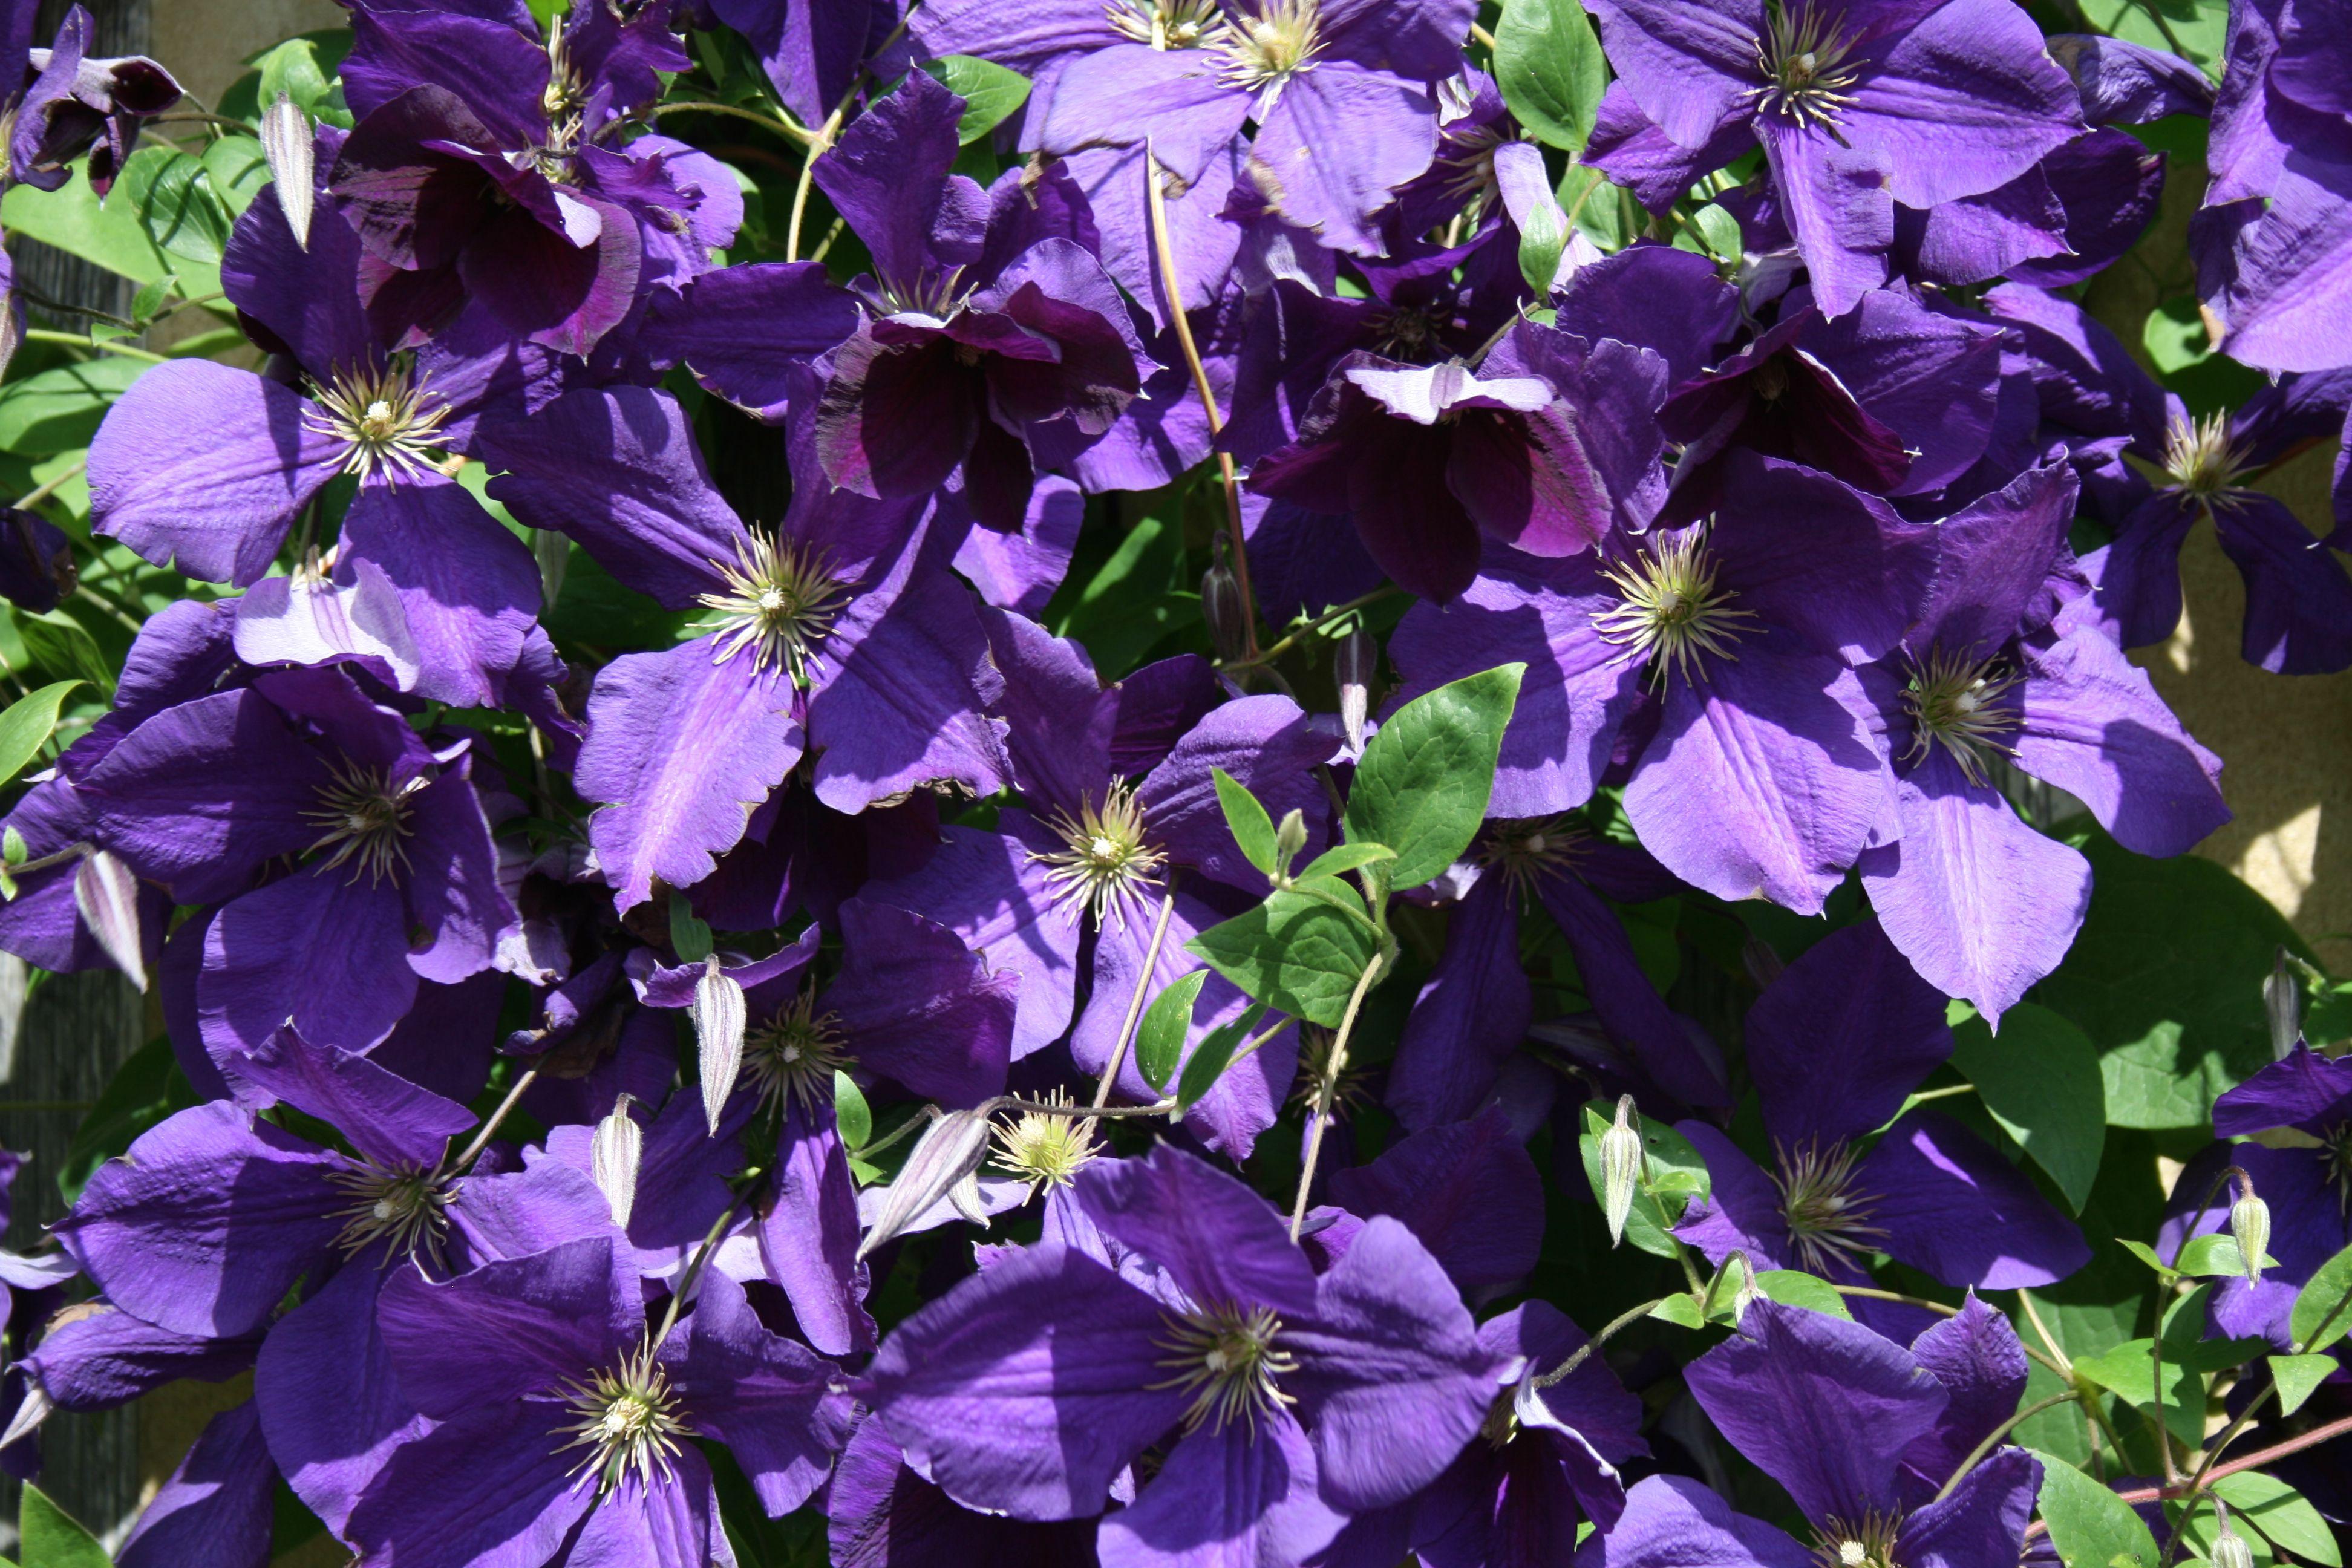 Clematis flowering at smallhythe place tenterden kent national